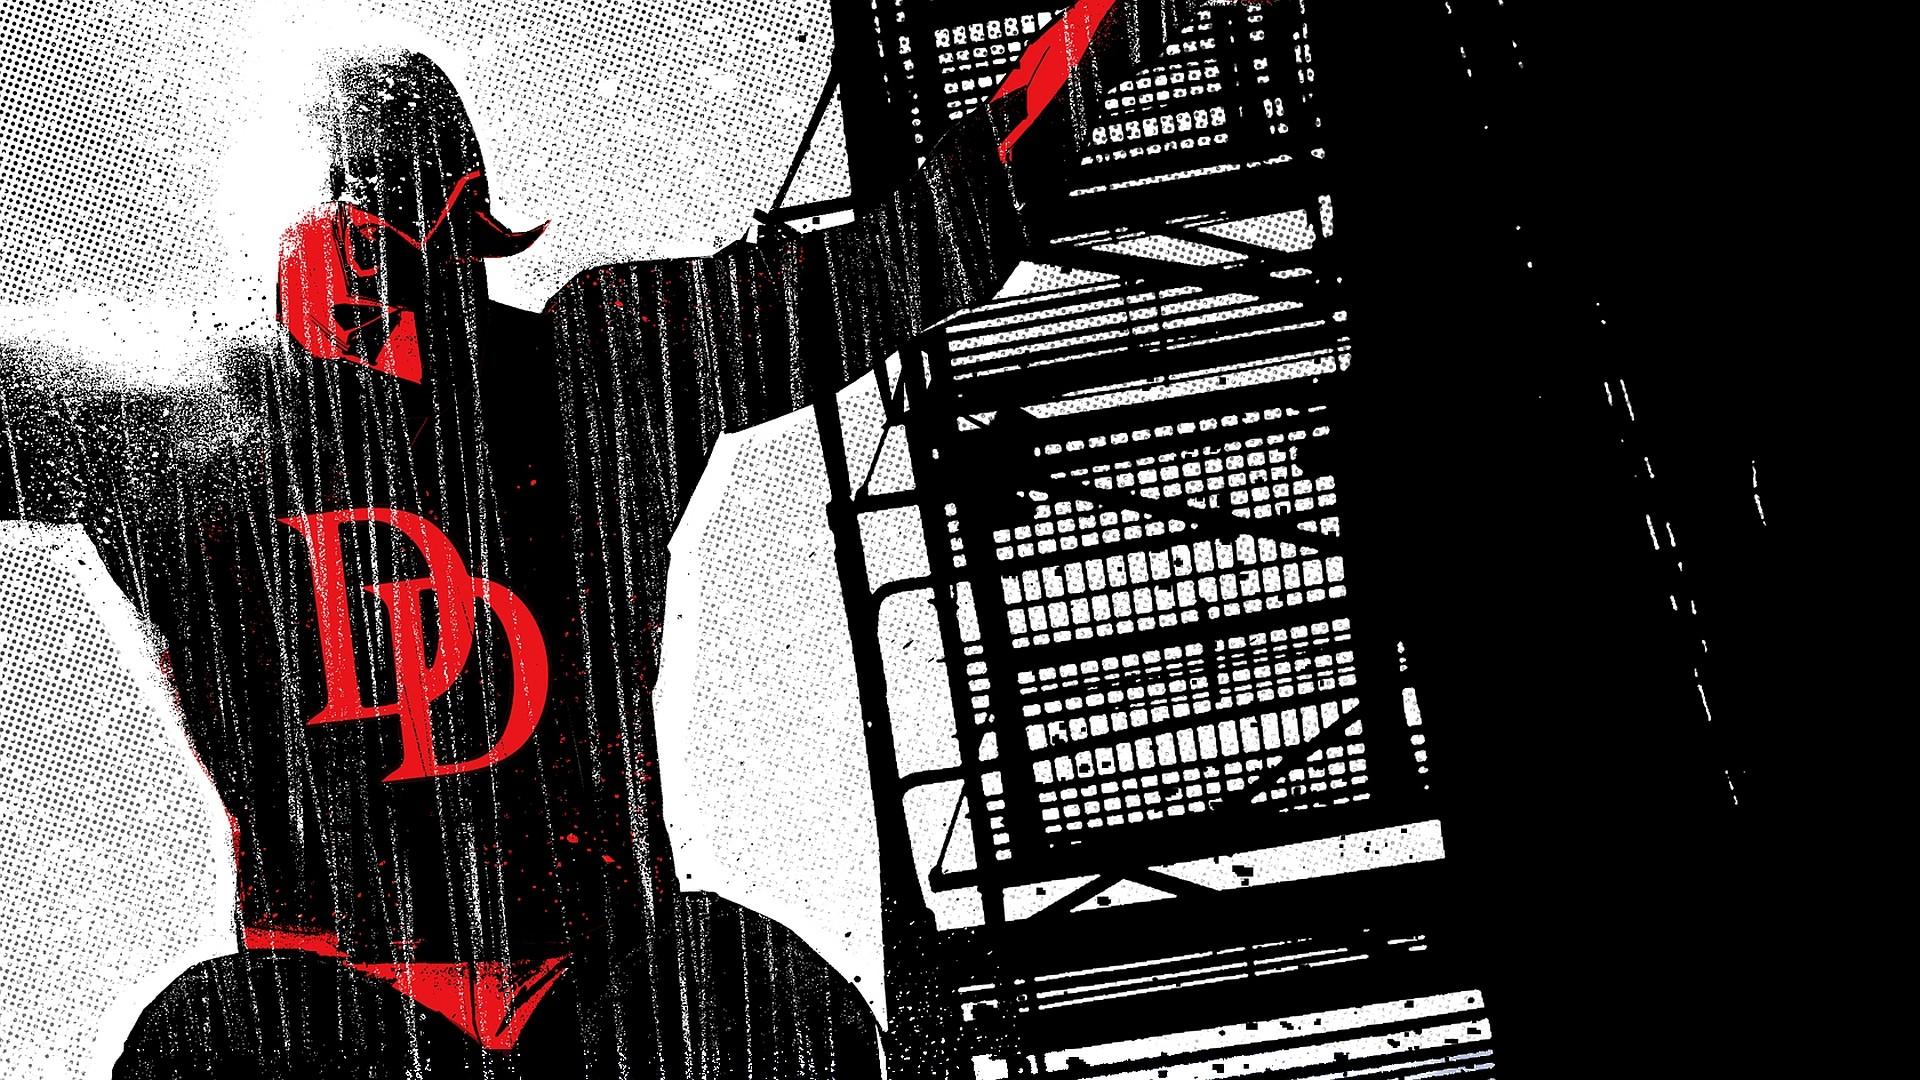 Comics – Daredevil Matt Murdock Wallpaper